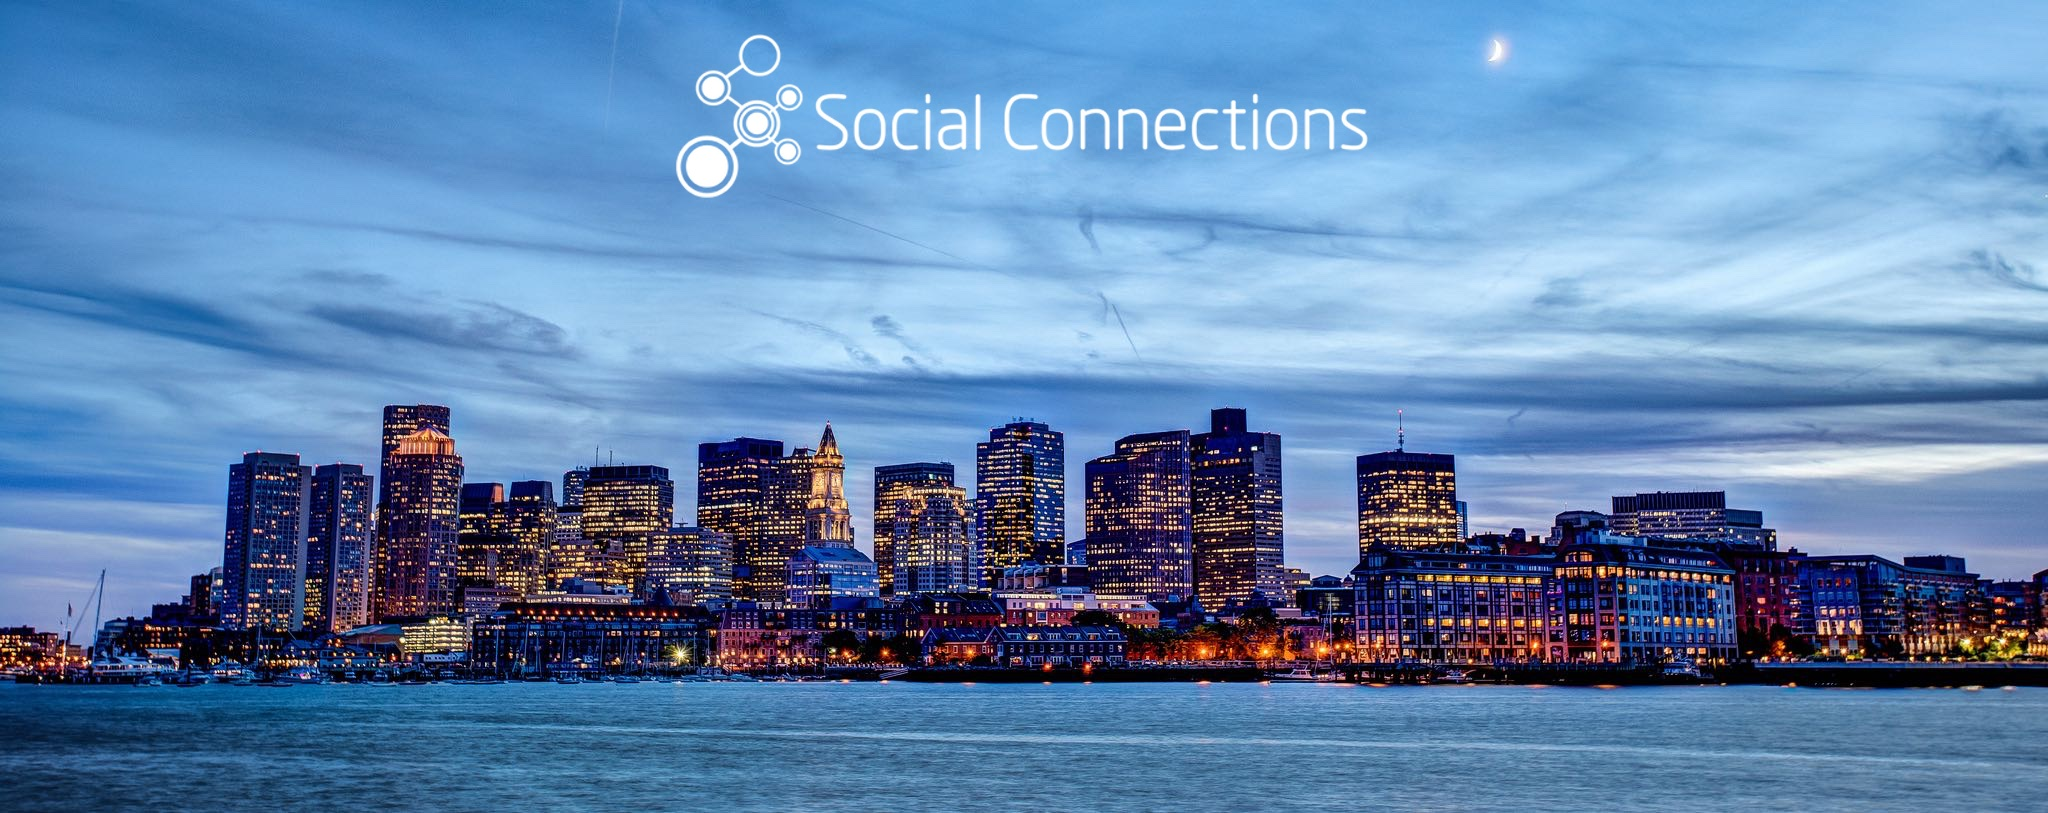 Boston Skyline with Soccnx logo